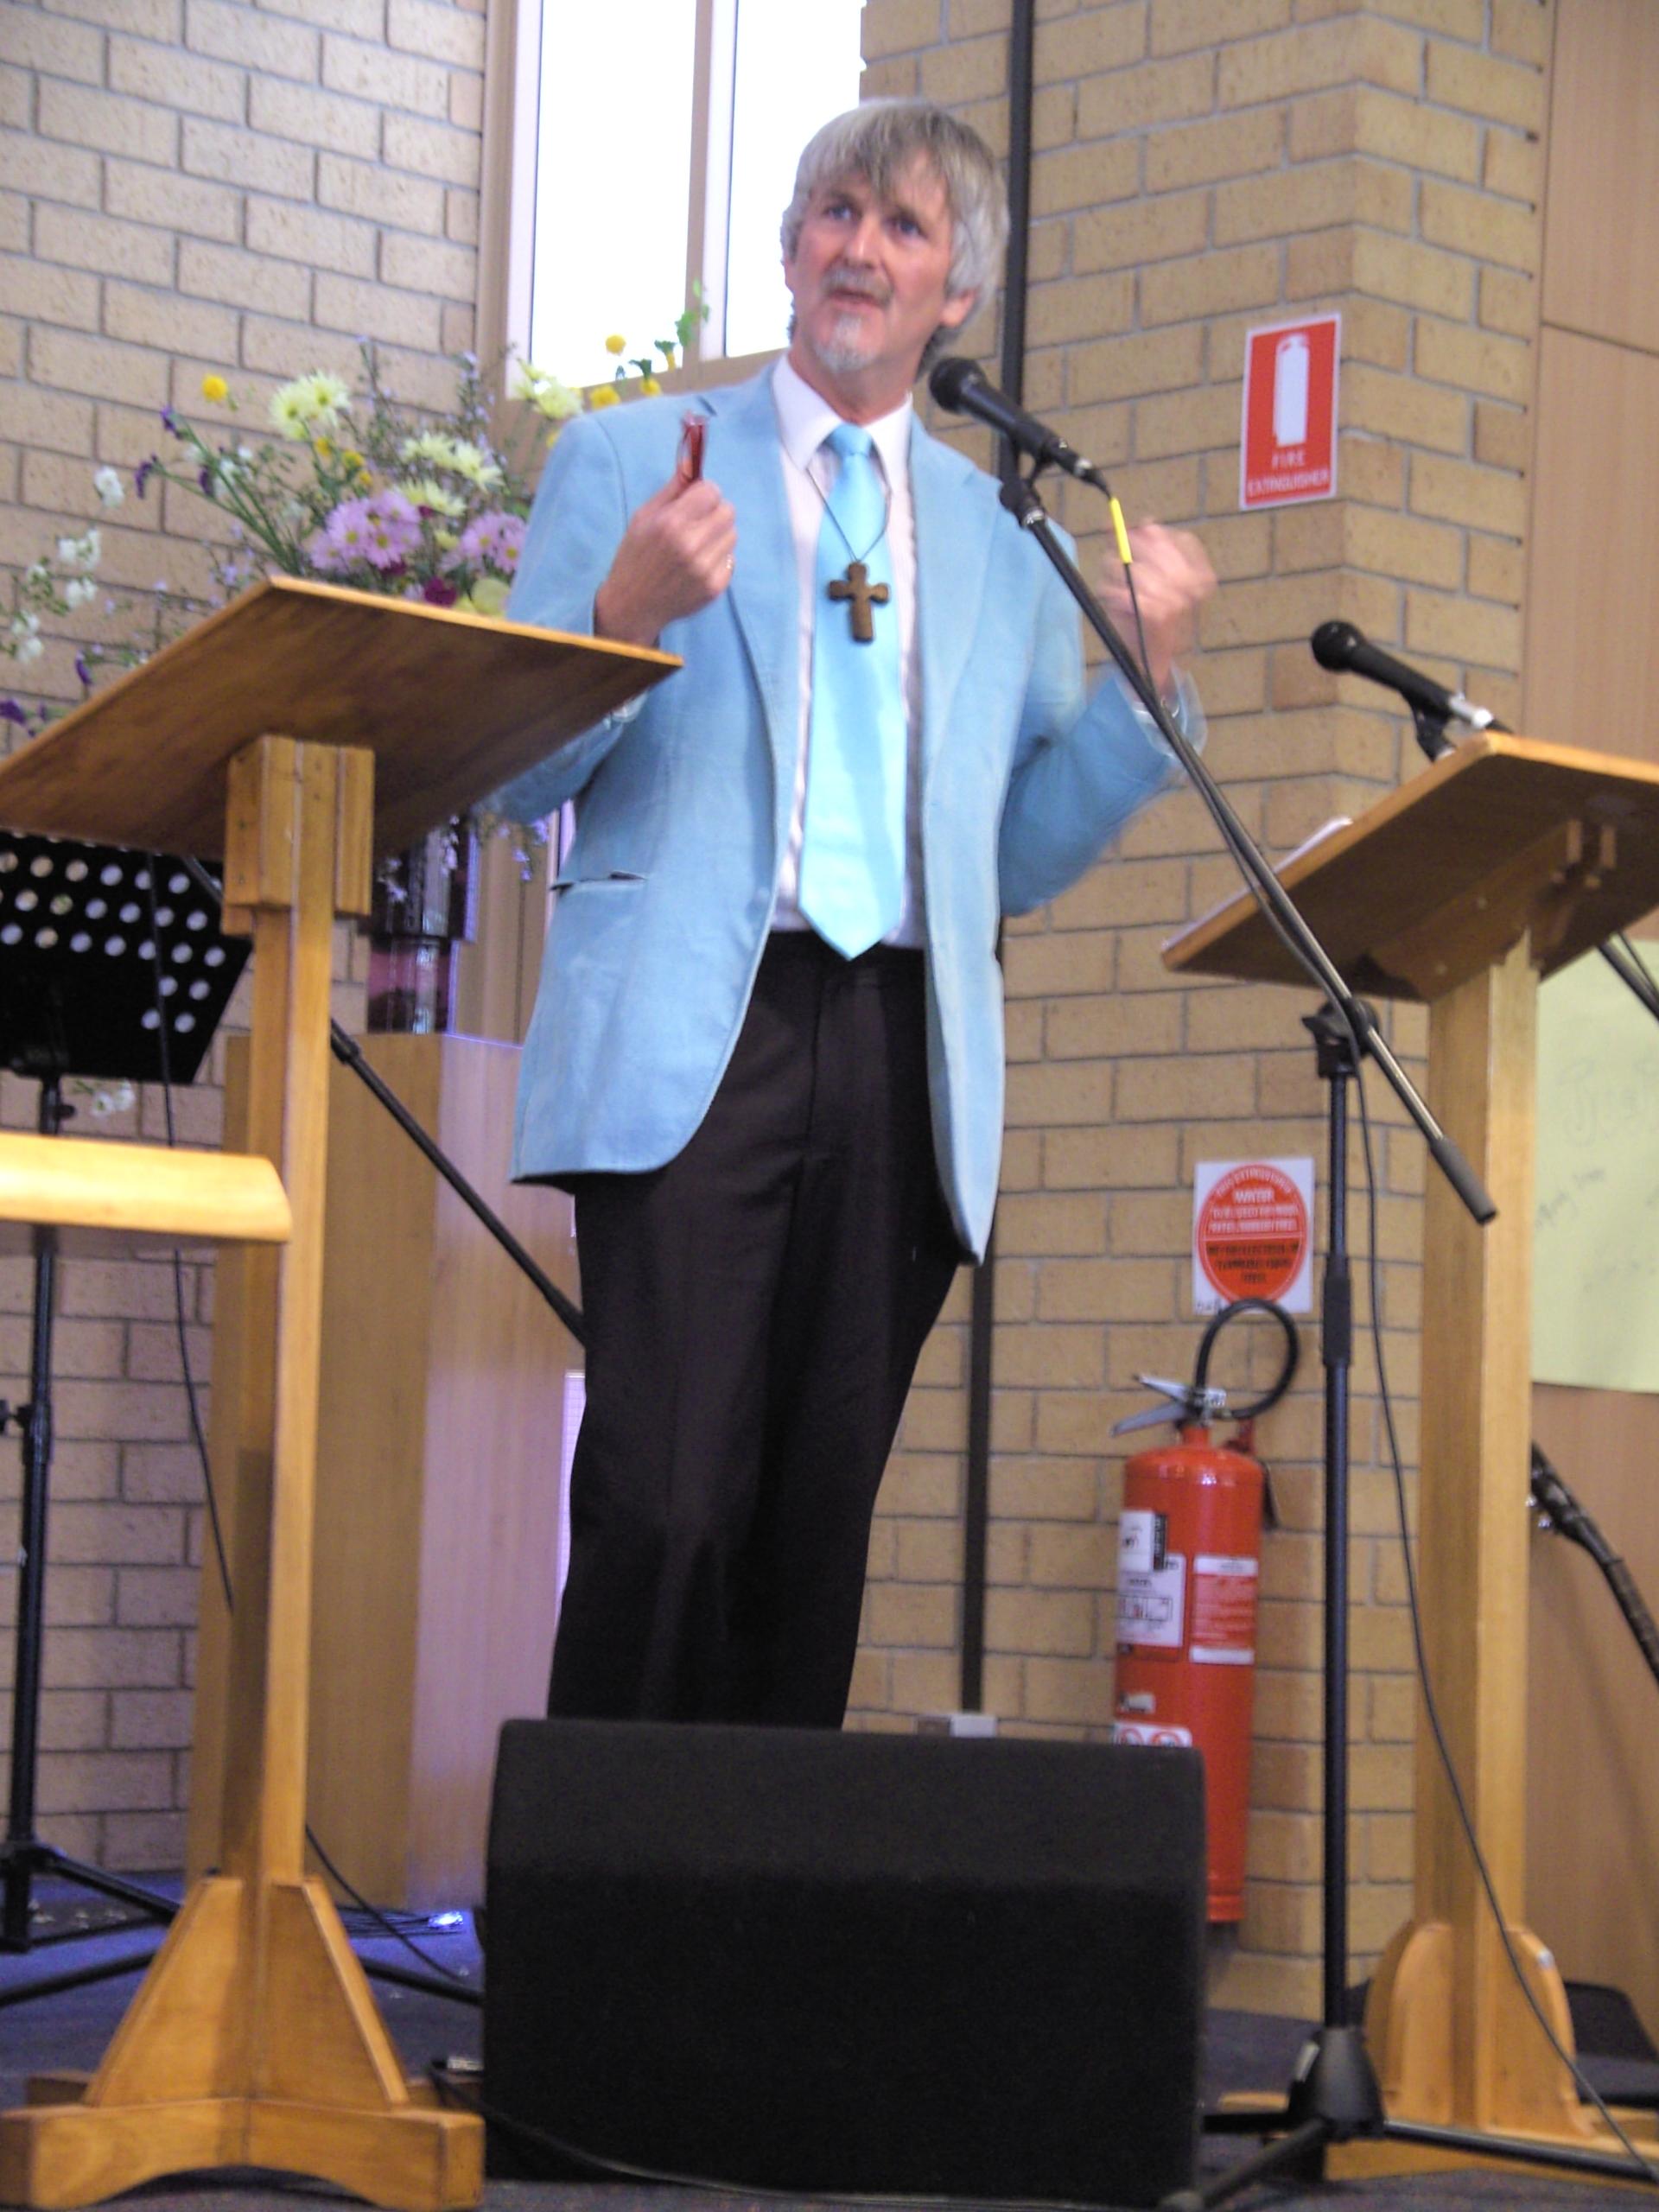 John L. Bell in 2009, Kippax Uniting Church, Canberra, Australië